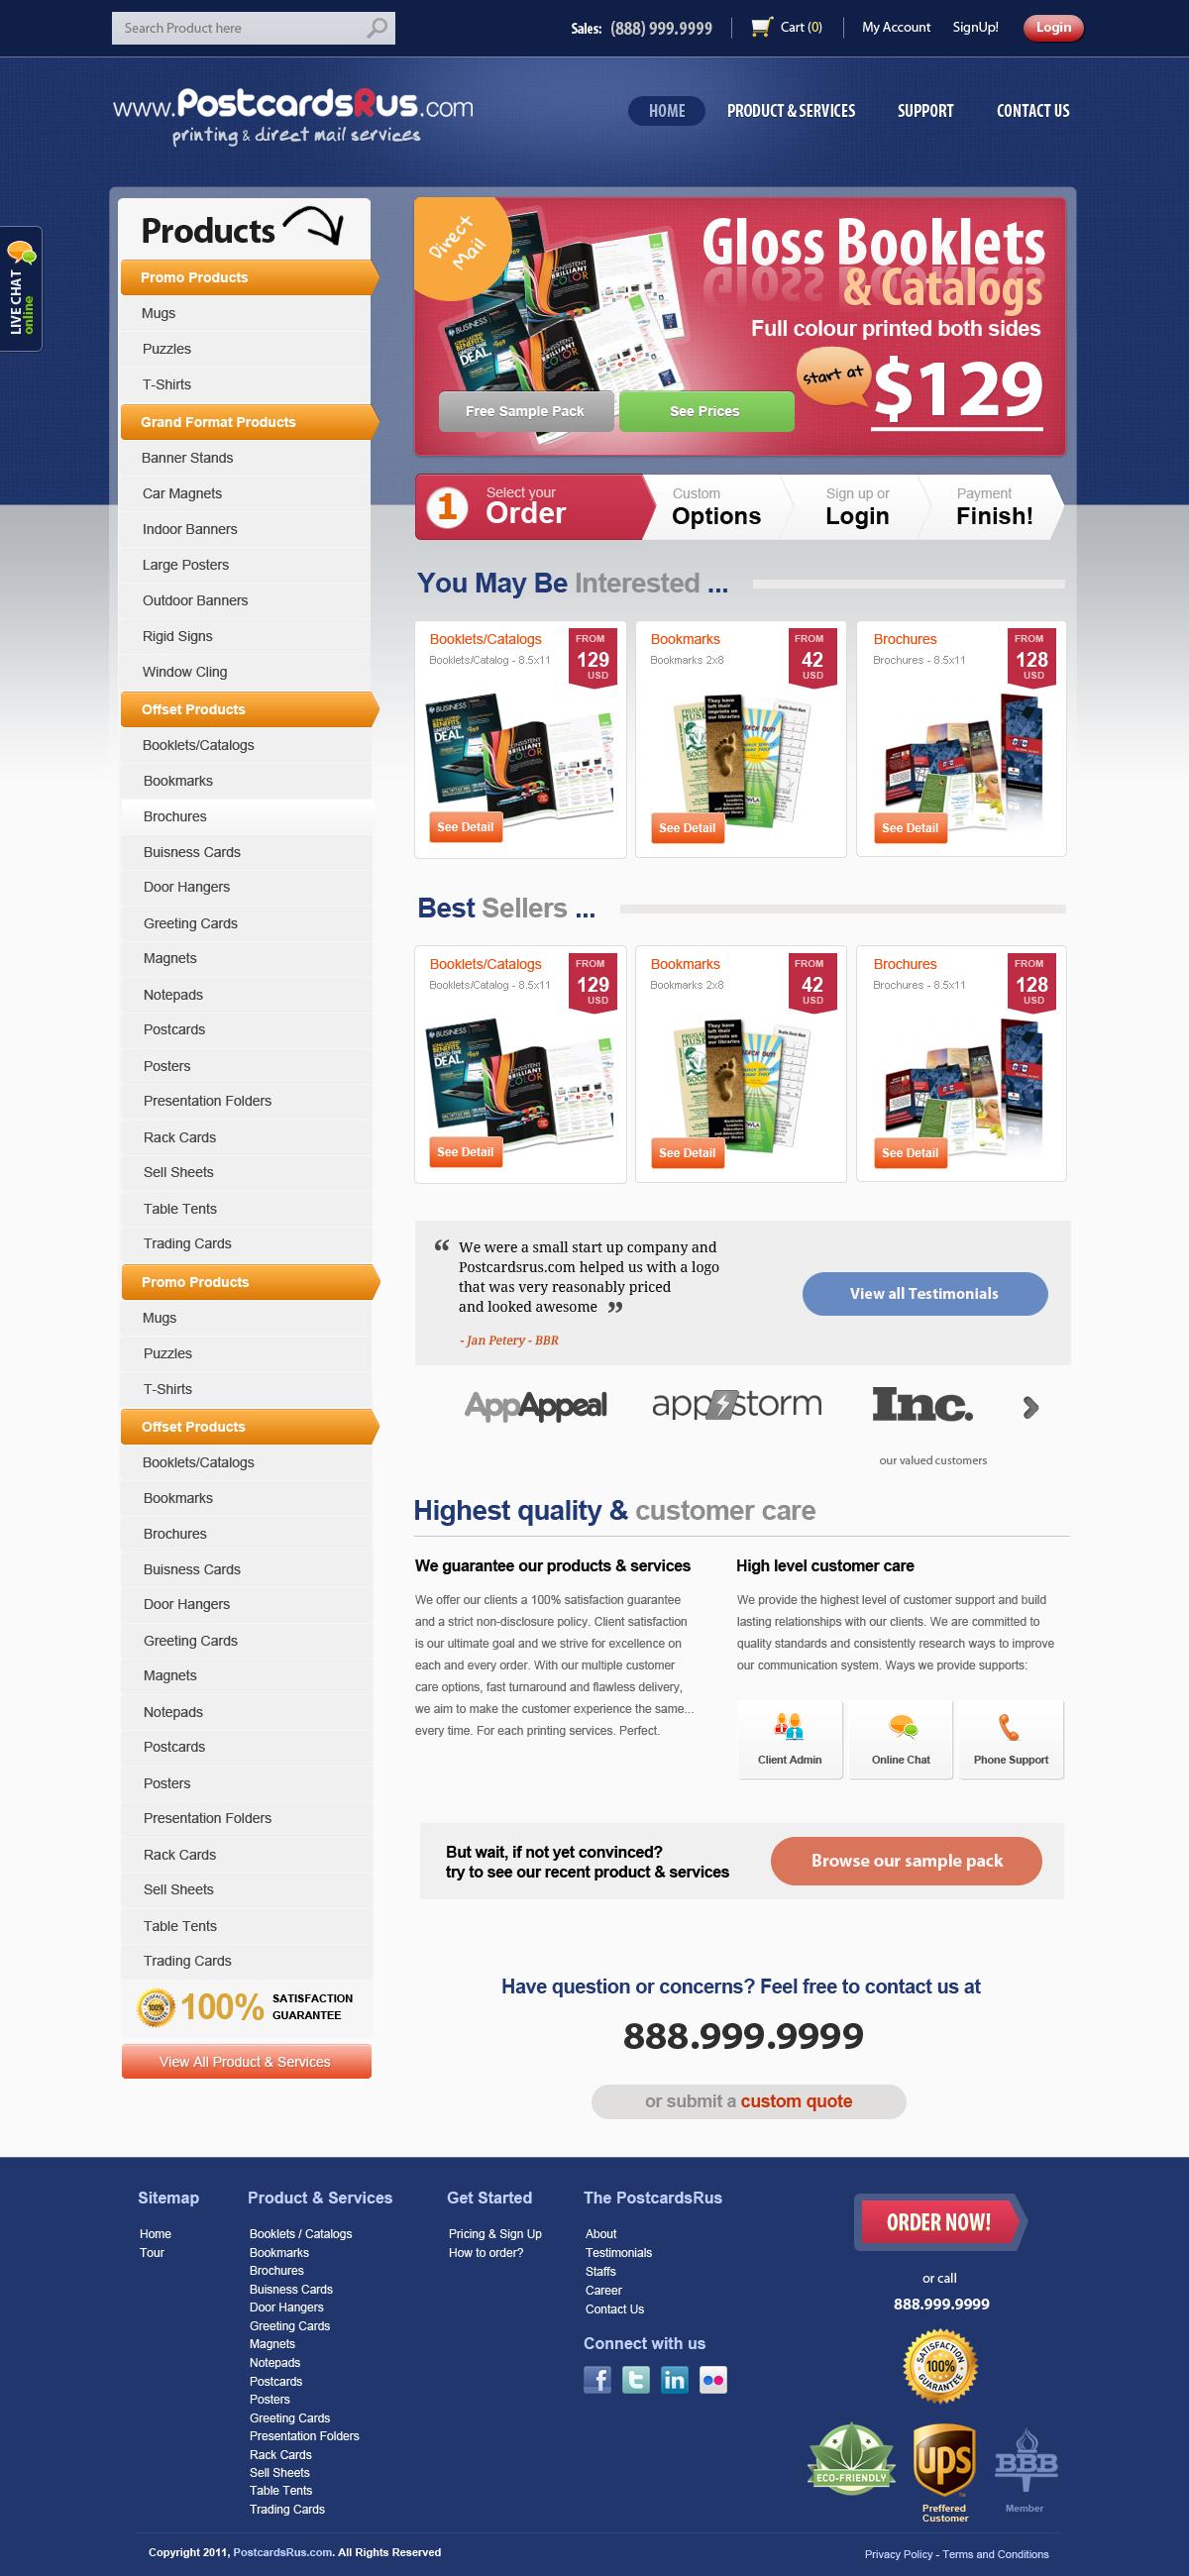 www.PostcardsRus.com needs a new website design